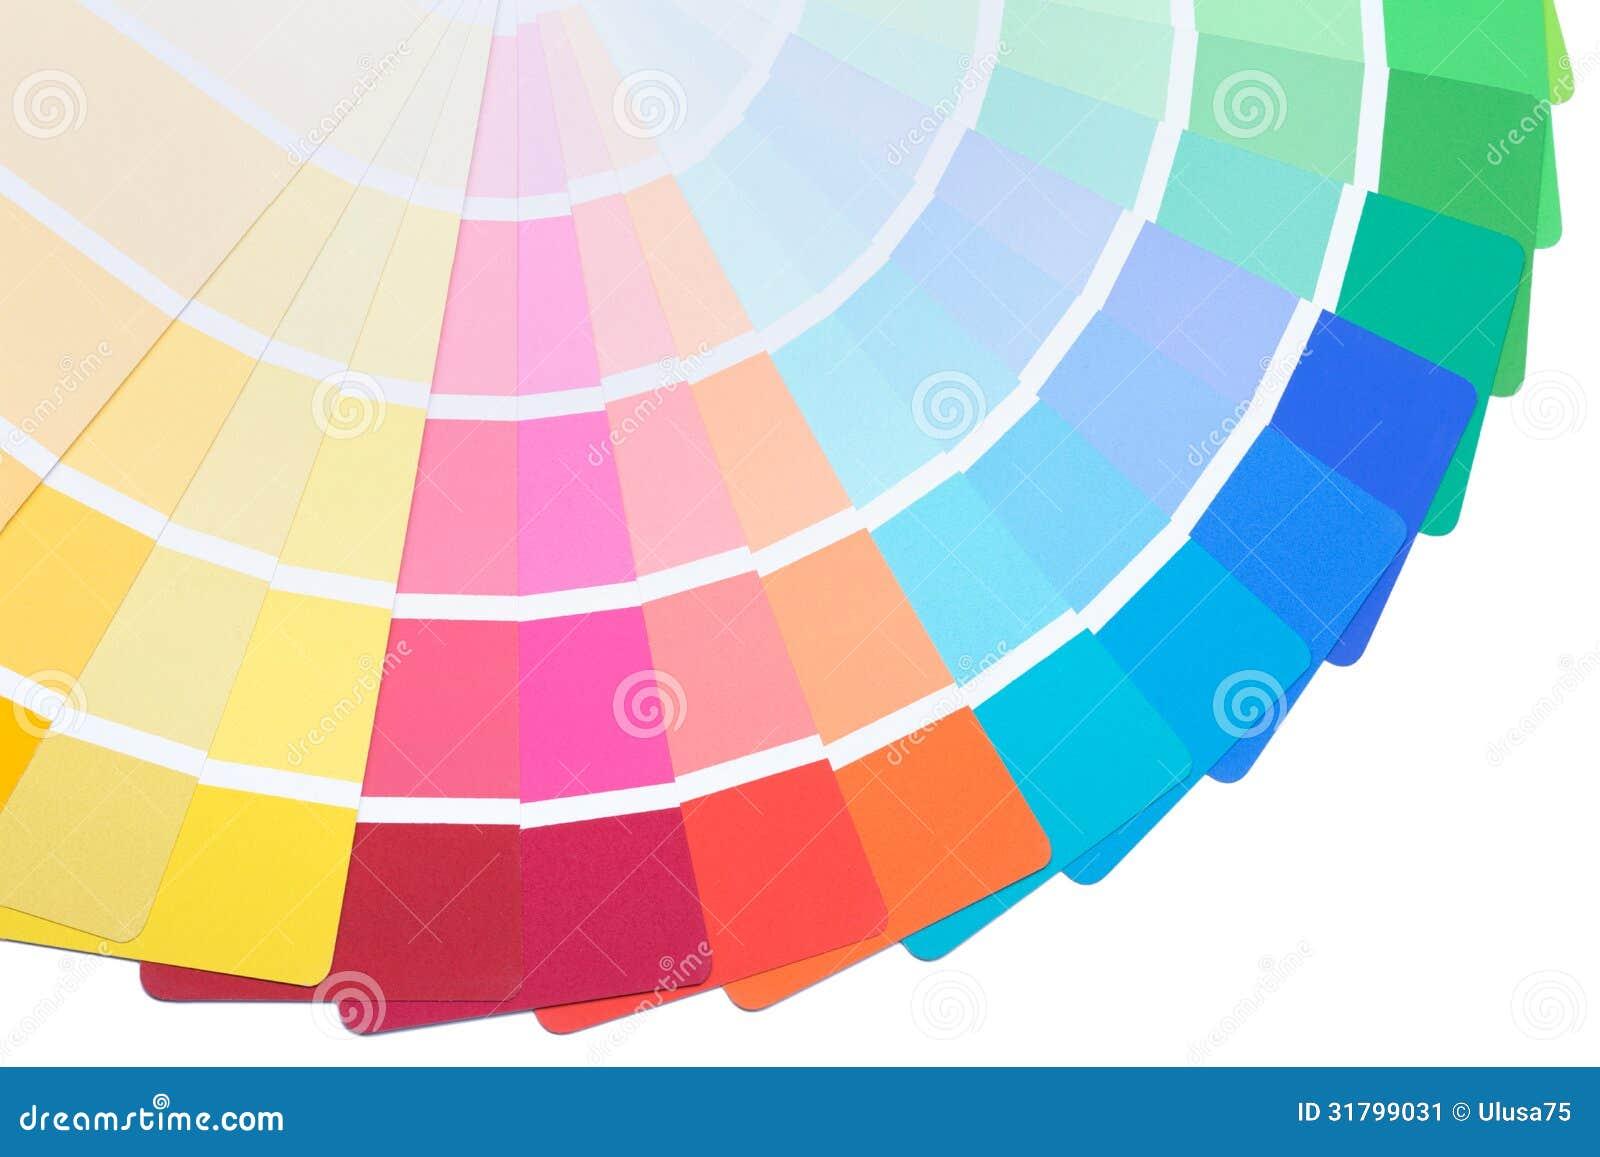 Guia da paleta de cores